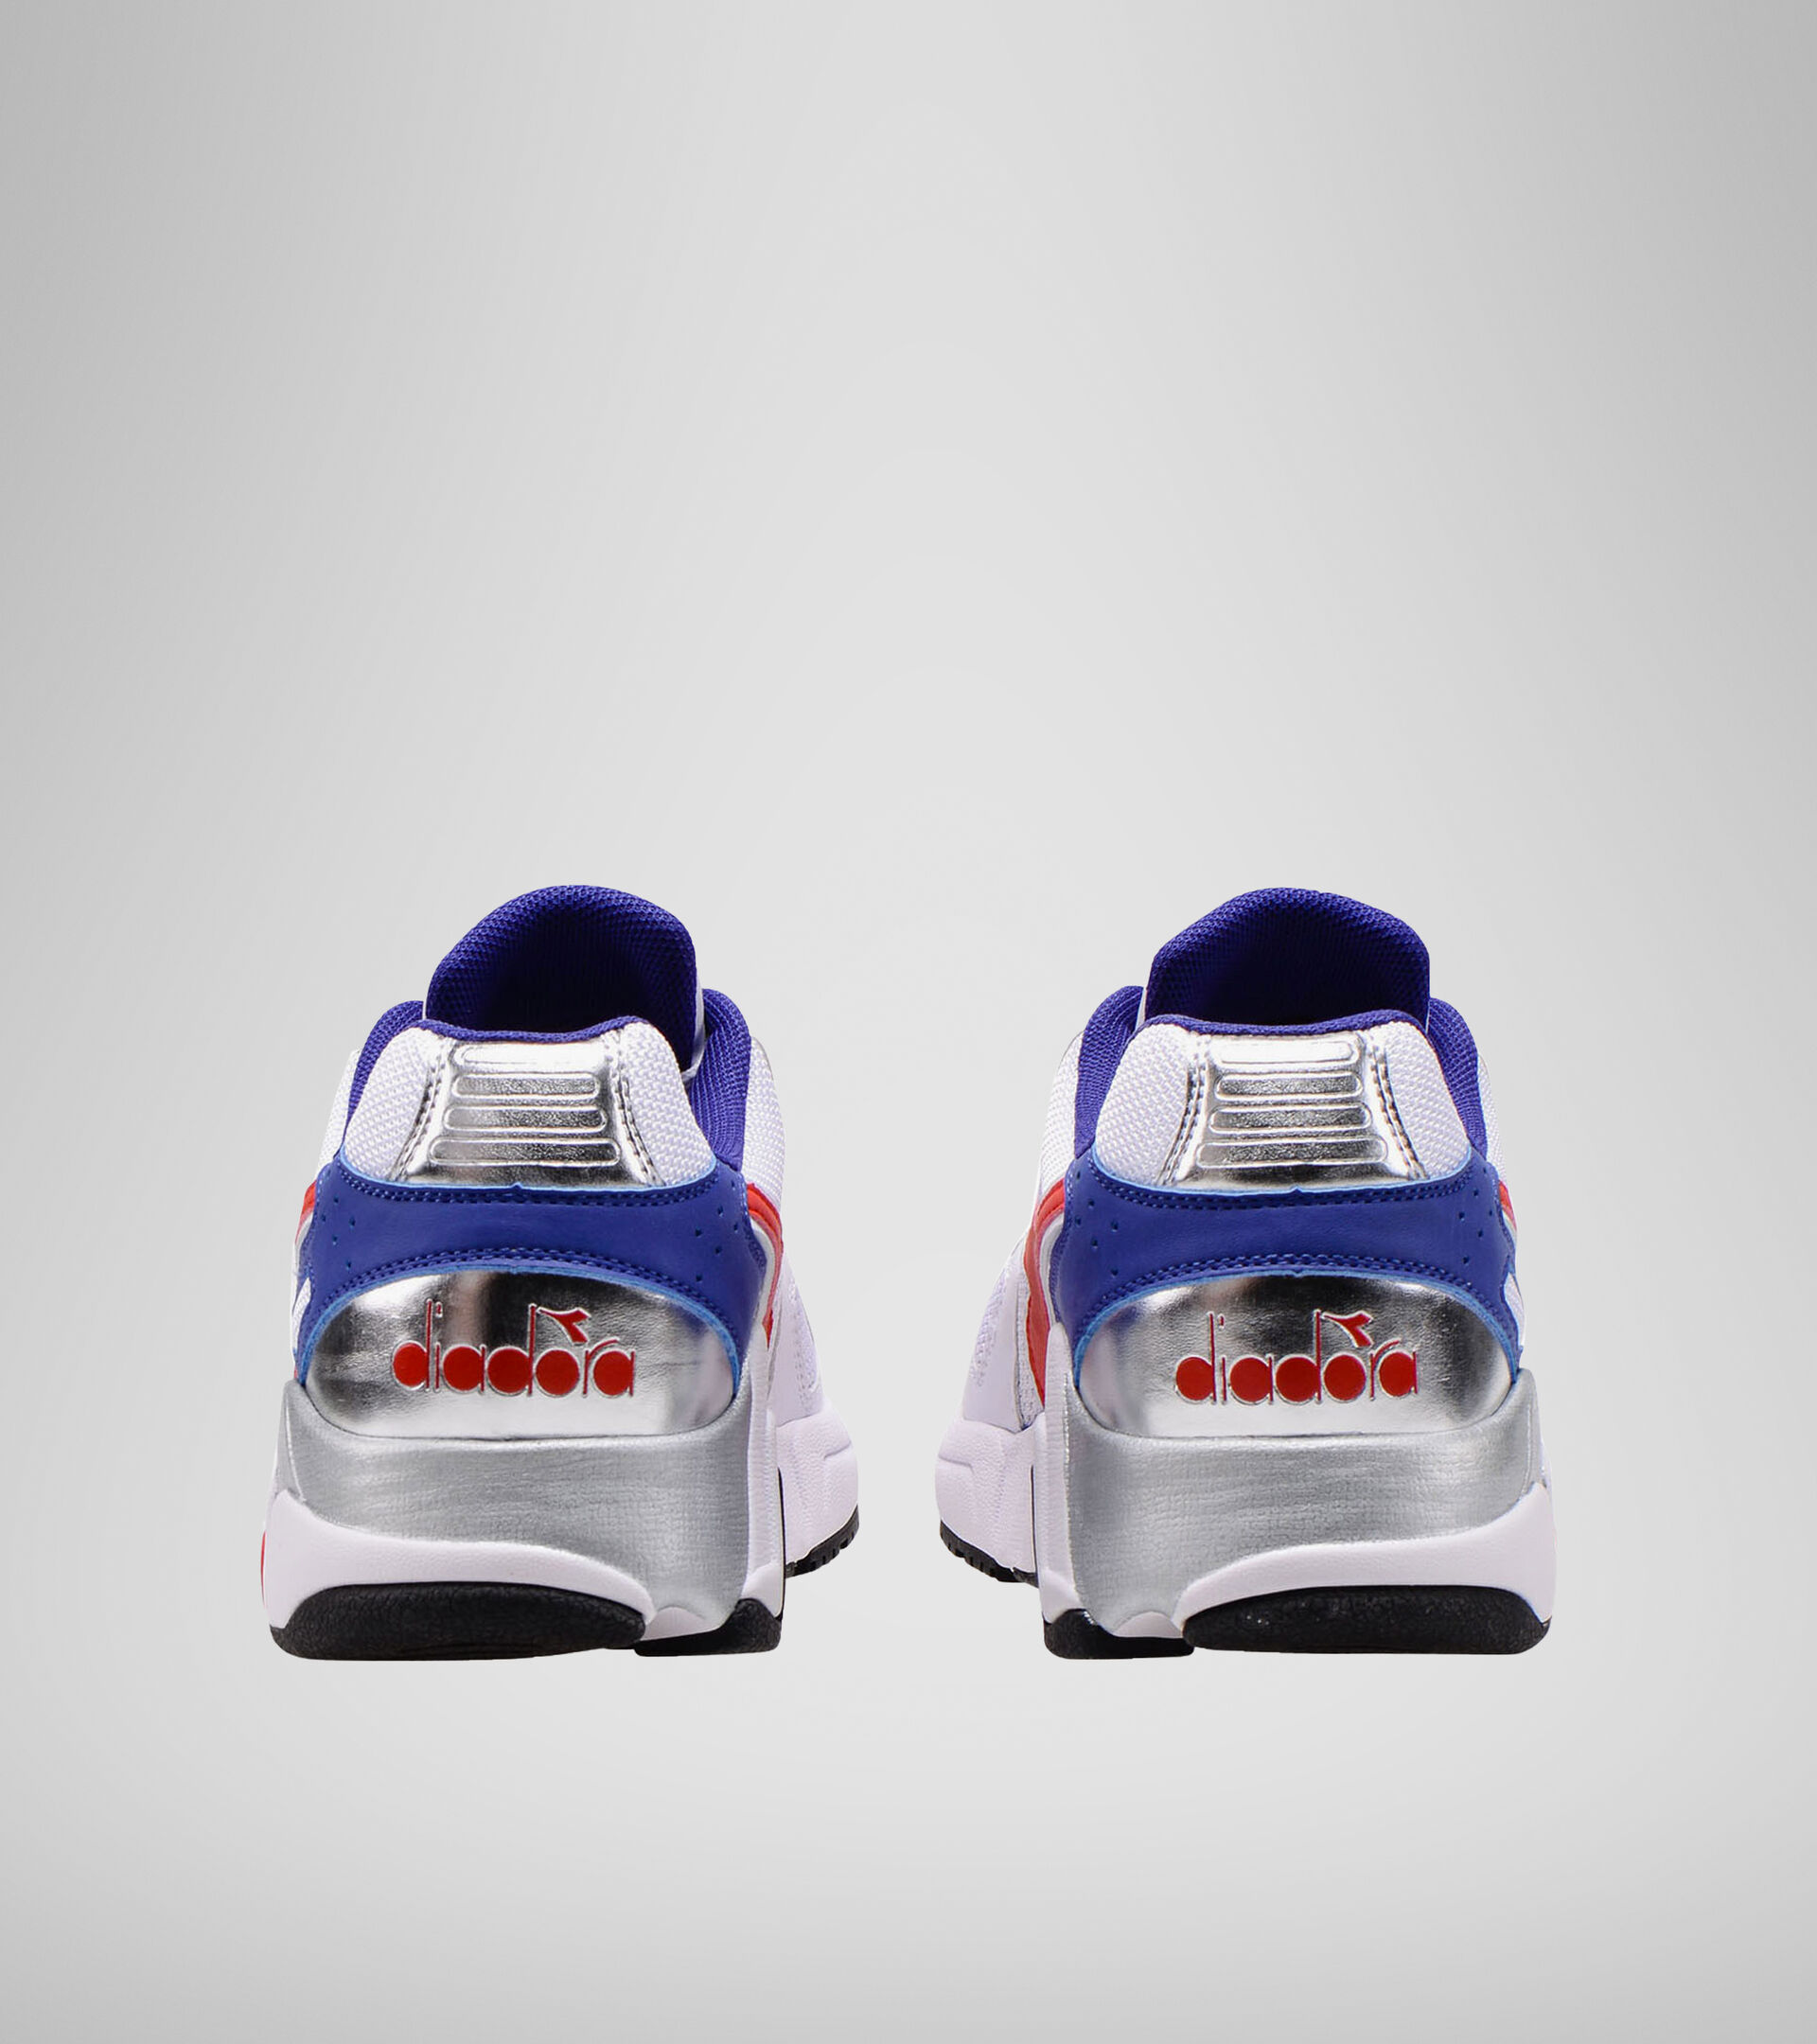 Footwear Sportswear UOMO MYTHOS WHITE/FIERY RED/SPECTRUM BLUE Diadora